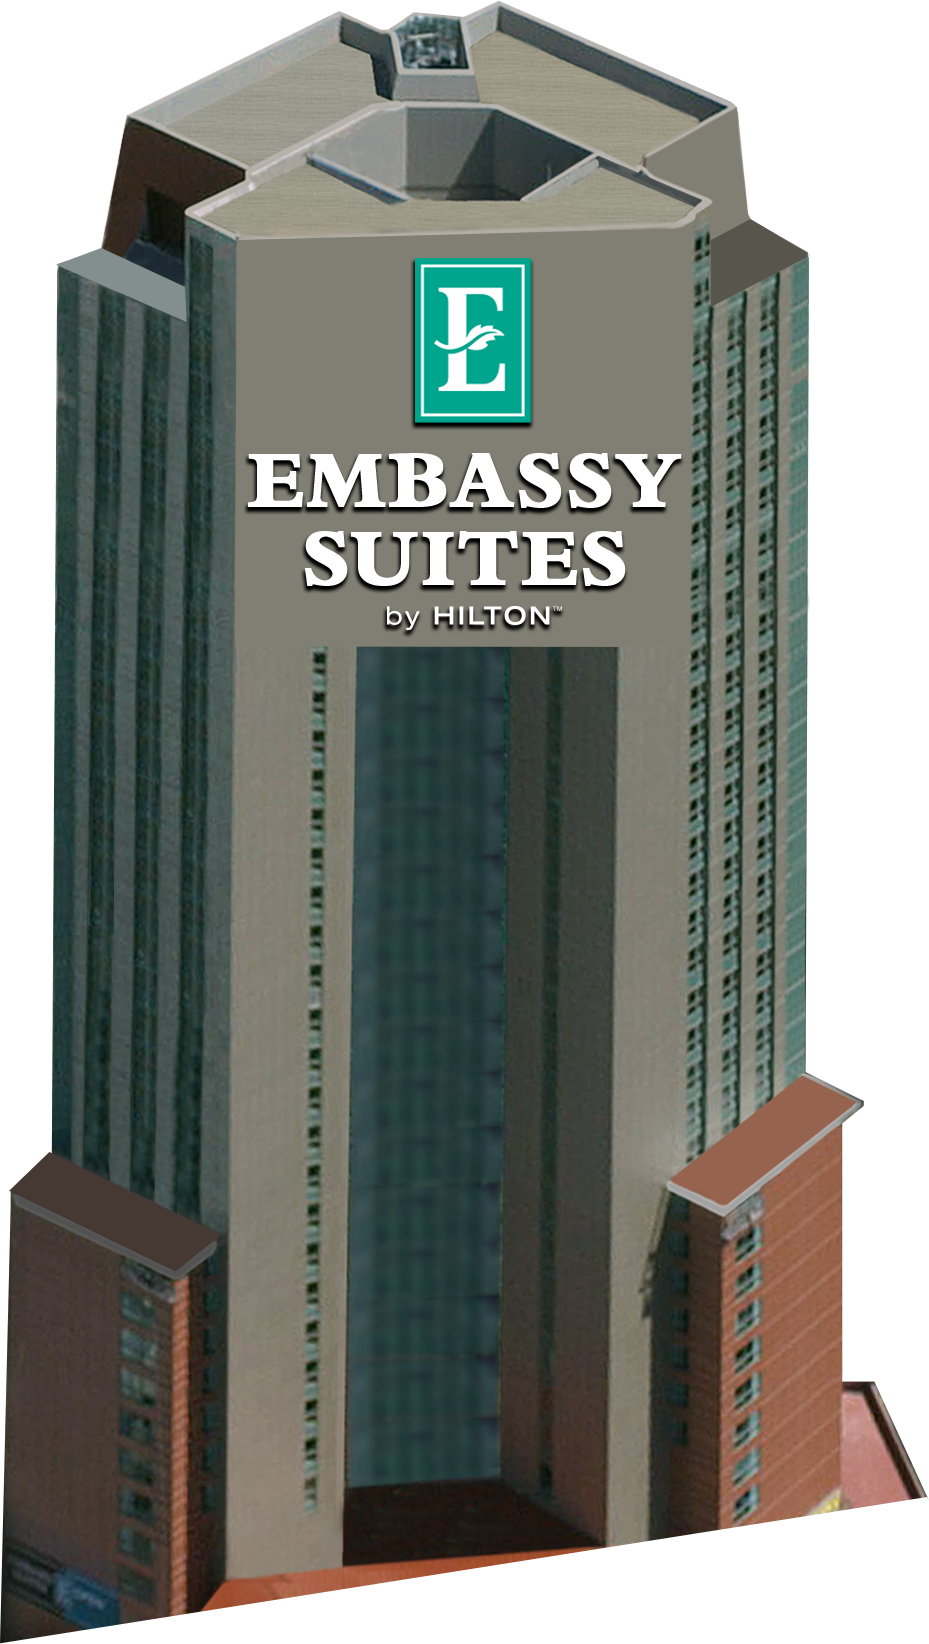 Niagara Falls Embassy Suites Fallsview Hotel Niagara Falls Hotels Embassy Suites Suites Niagara Falls Hotels